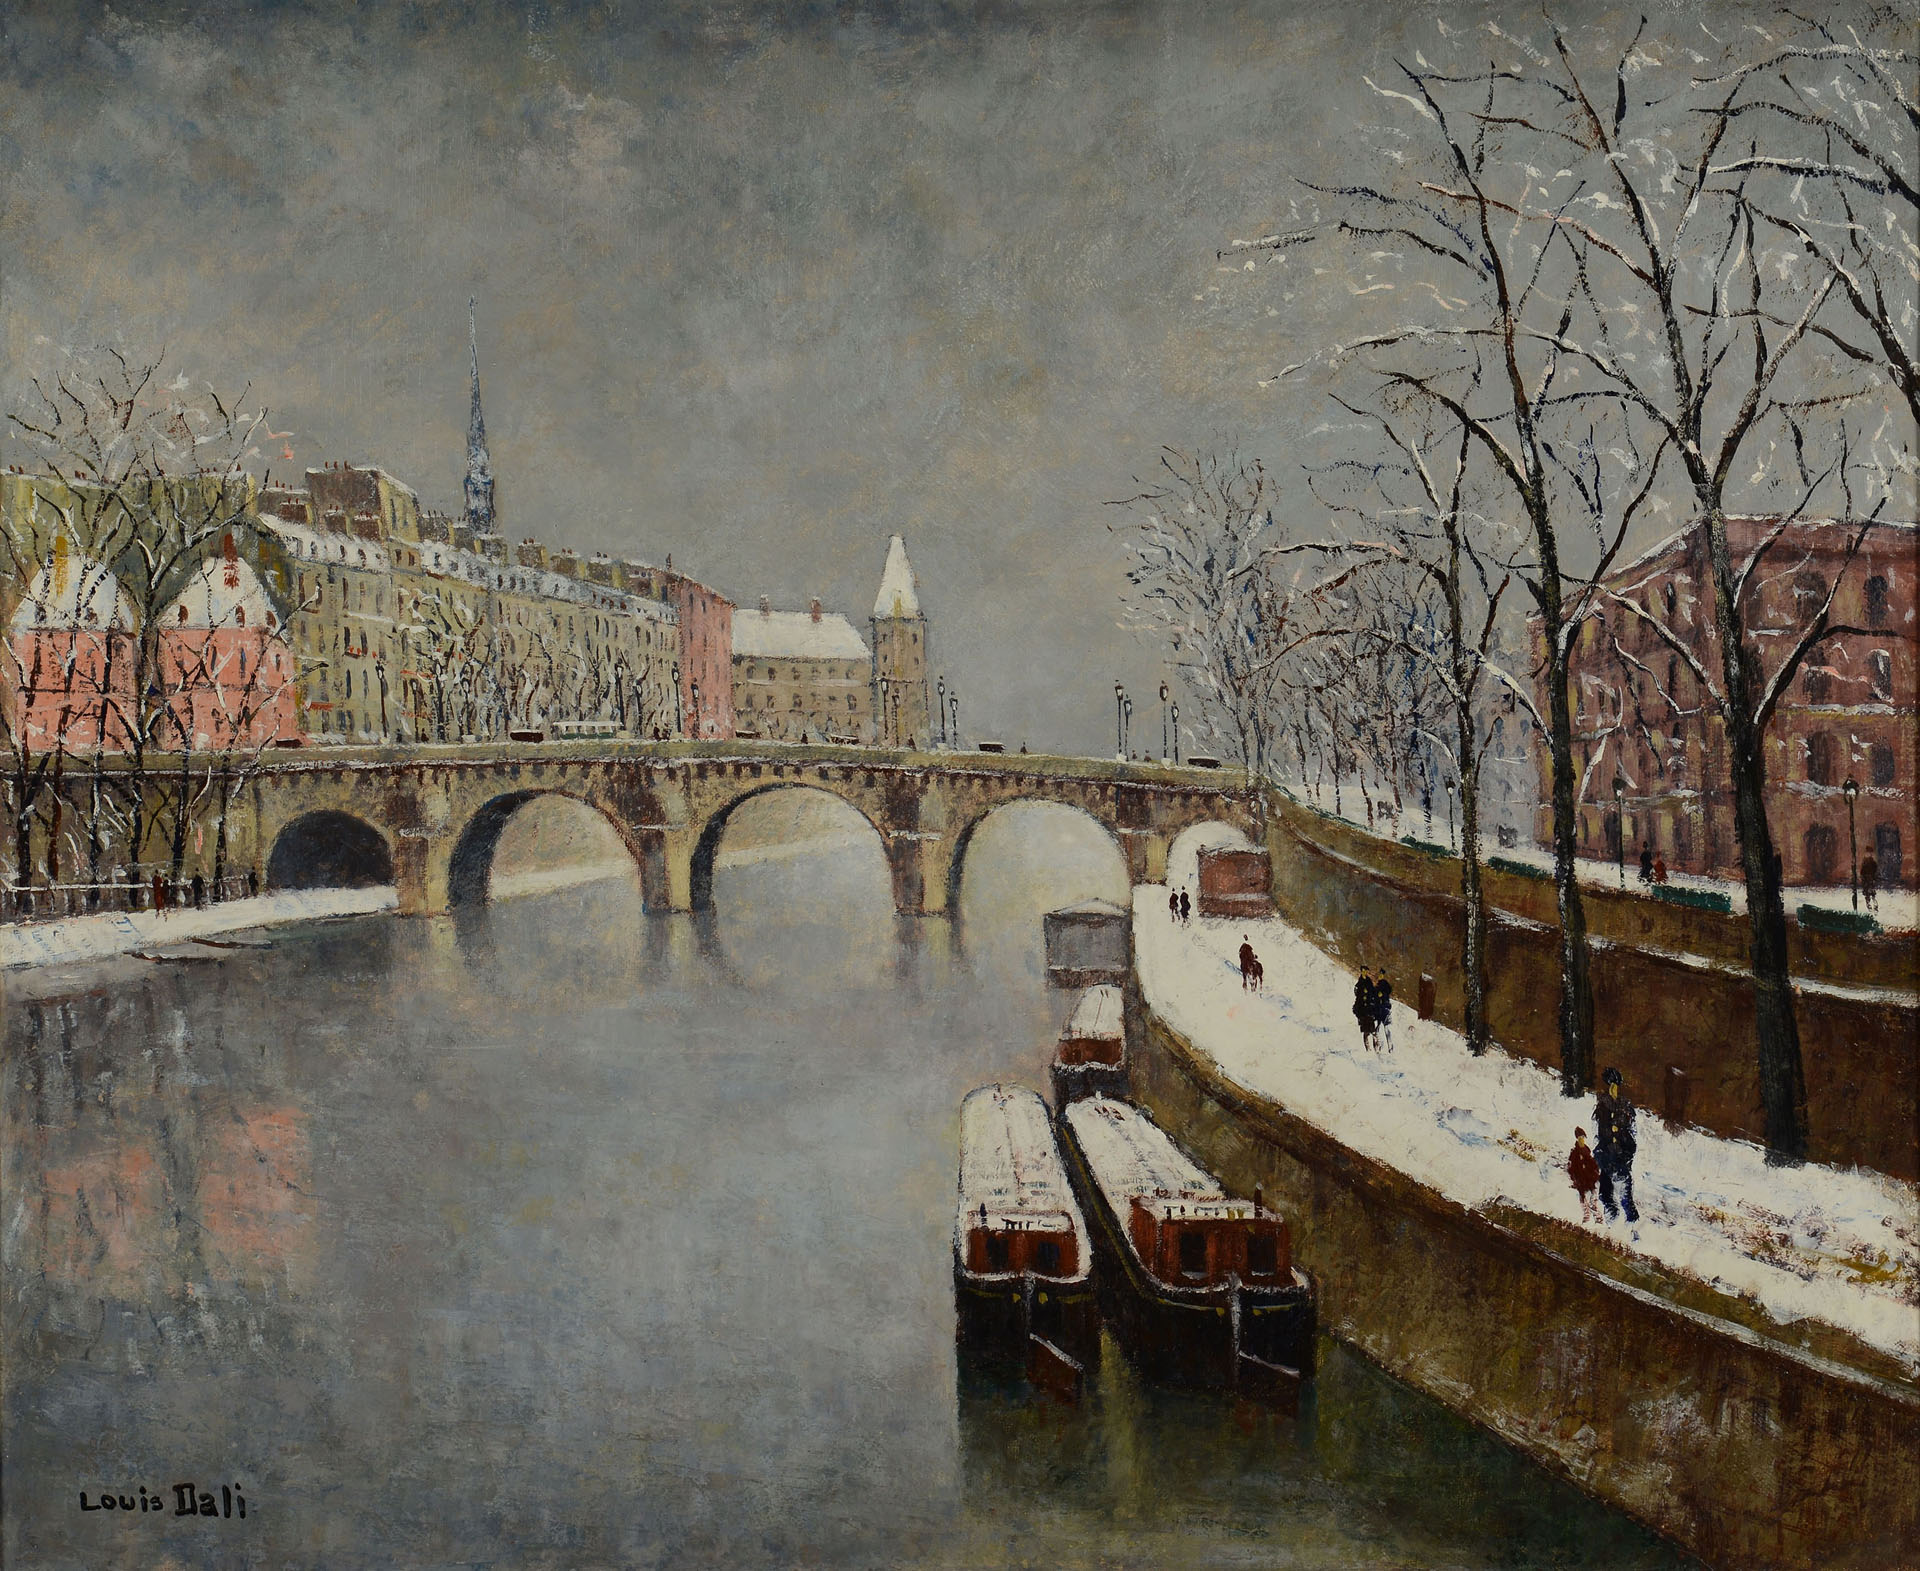 Lot 206 Louis Dali Oil On Canvas Paris Winter Scene